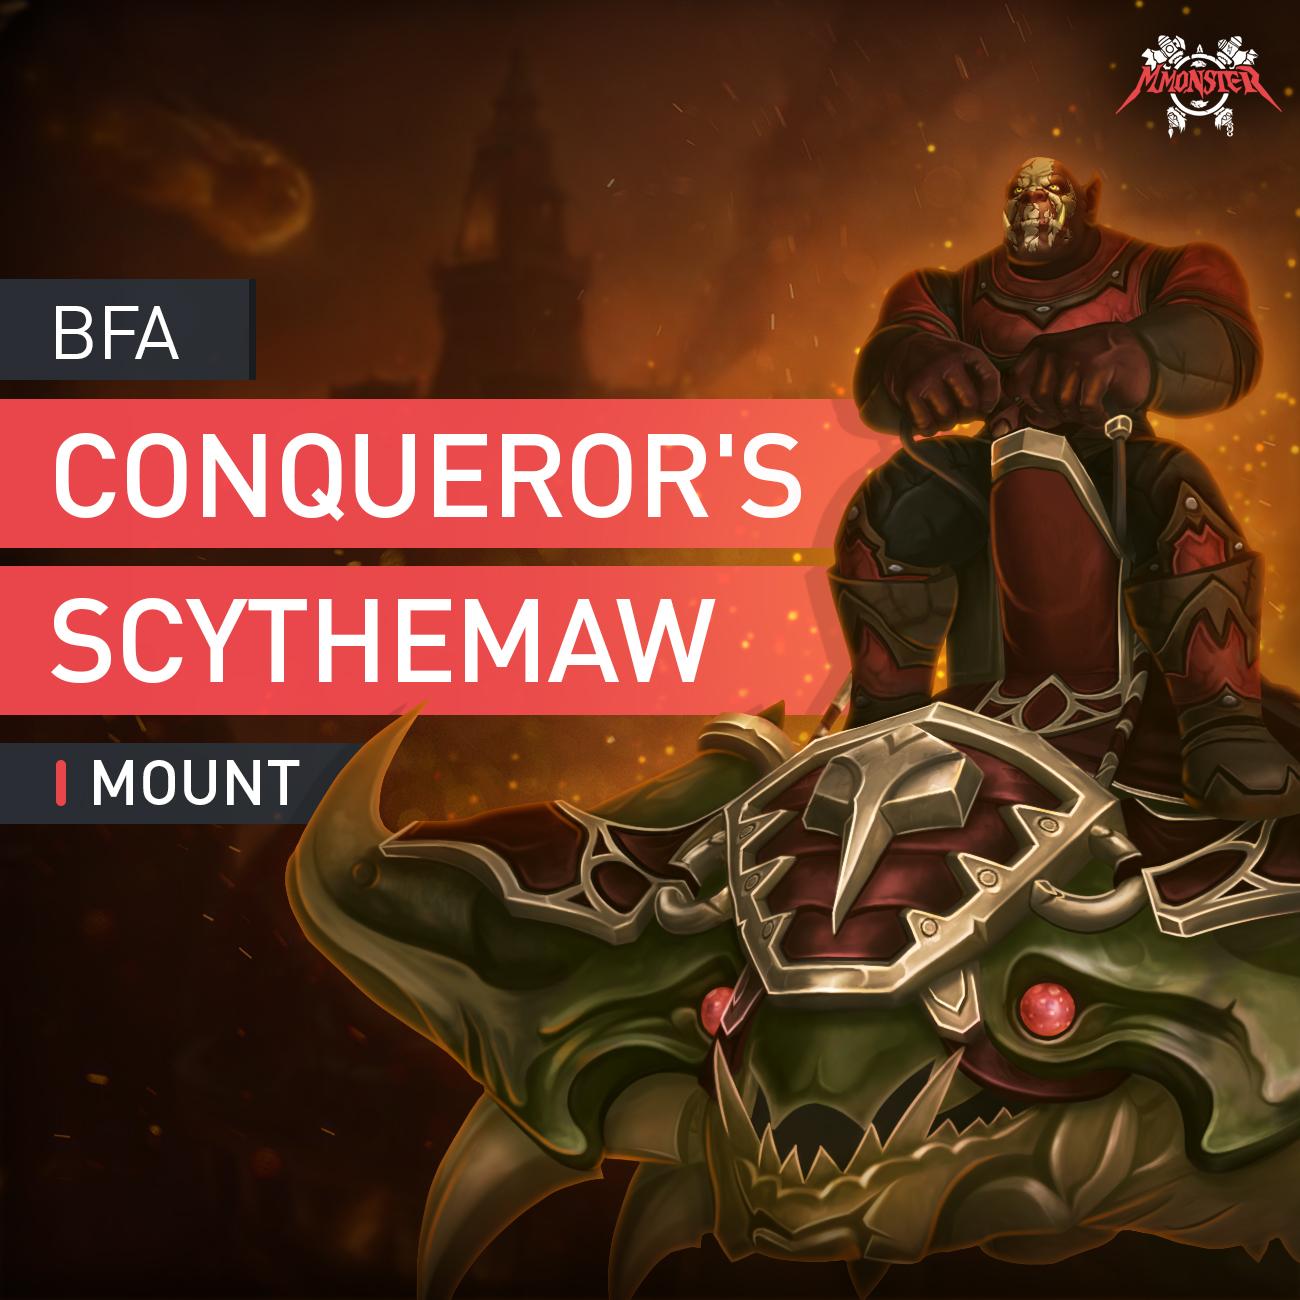 Conqueror's Scythemaw